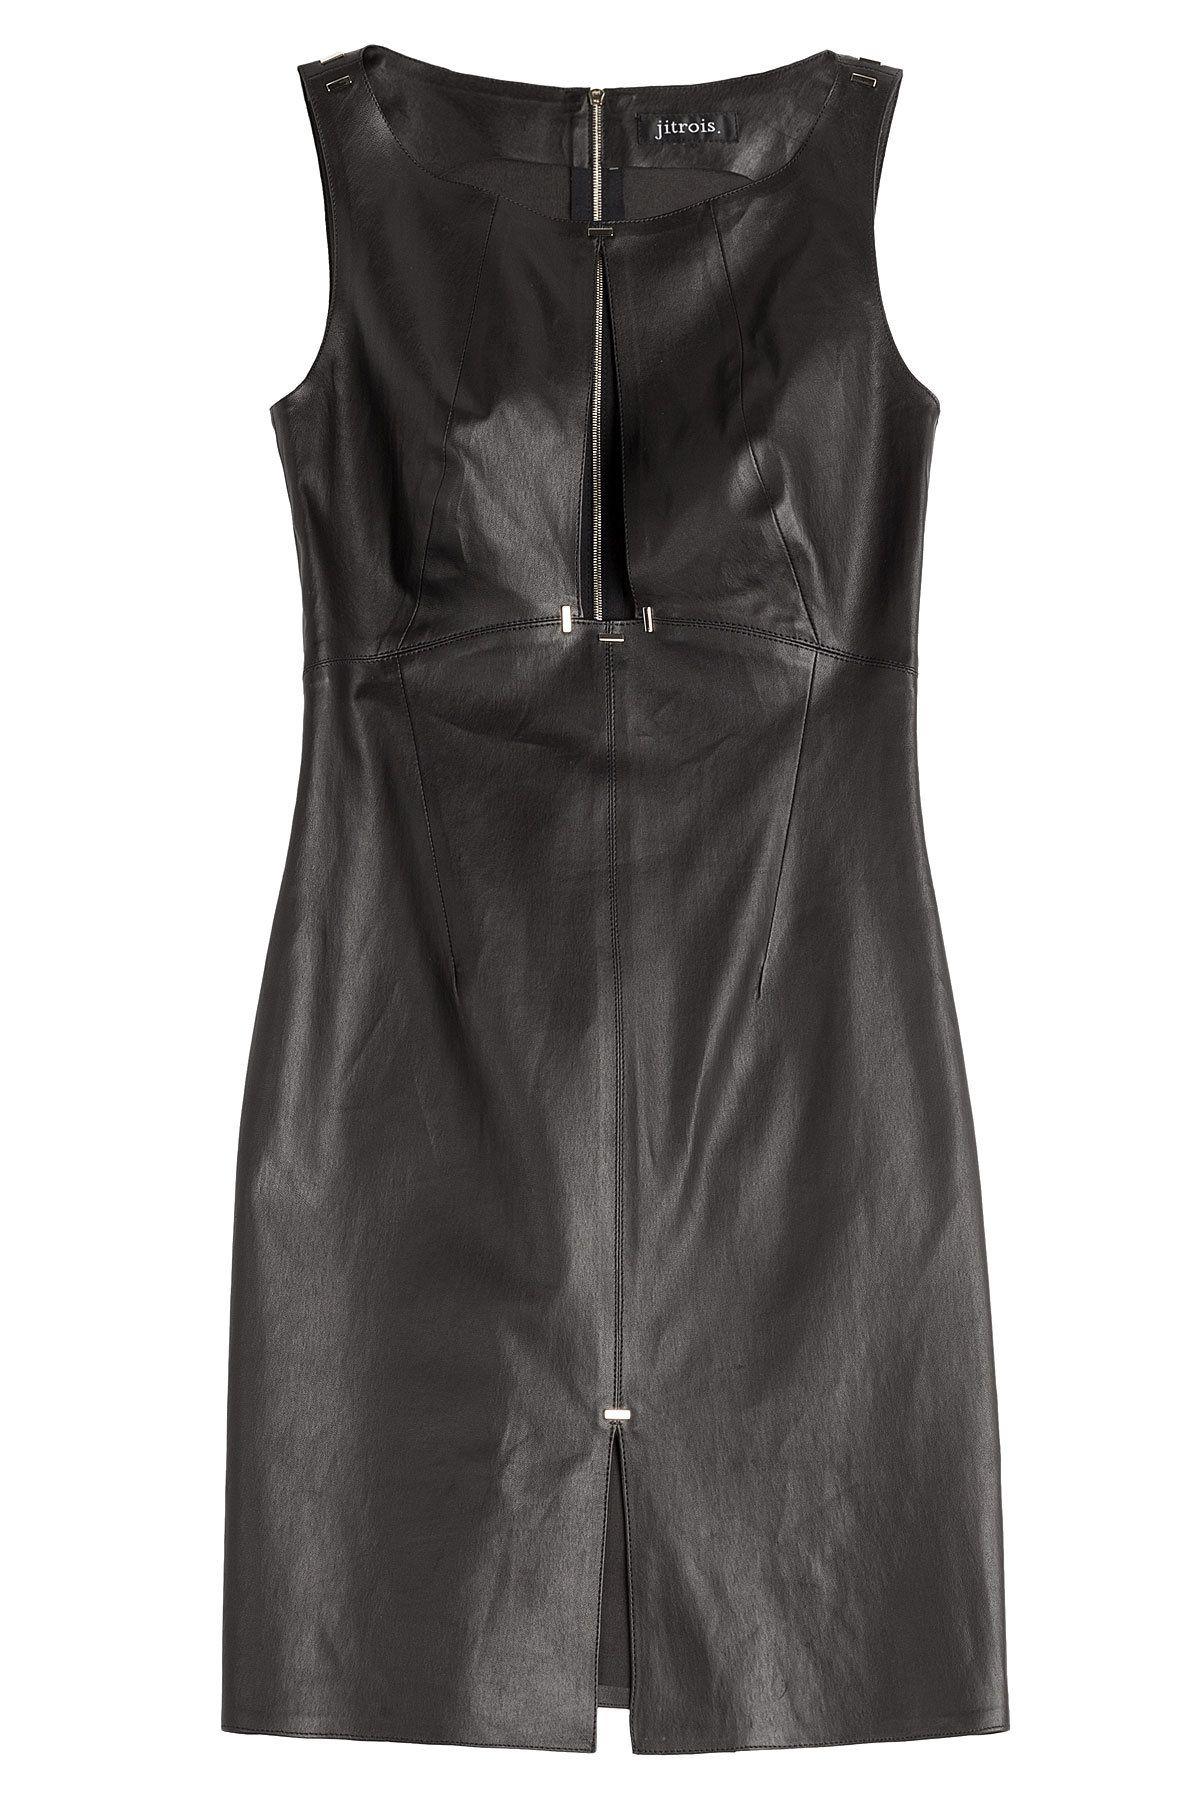 Jitrois - Leather Dress with Keyhole Front   deri elbise   Pinterest 3bbc959b6035